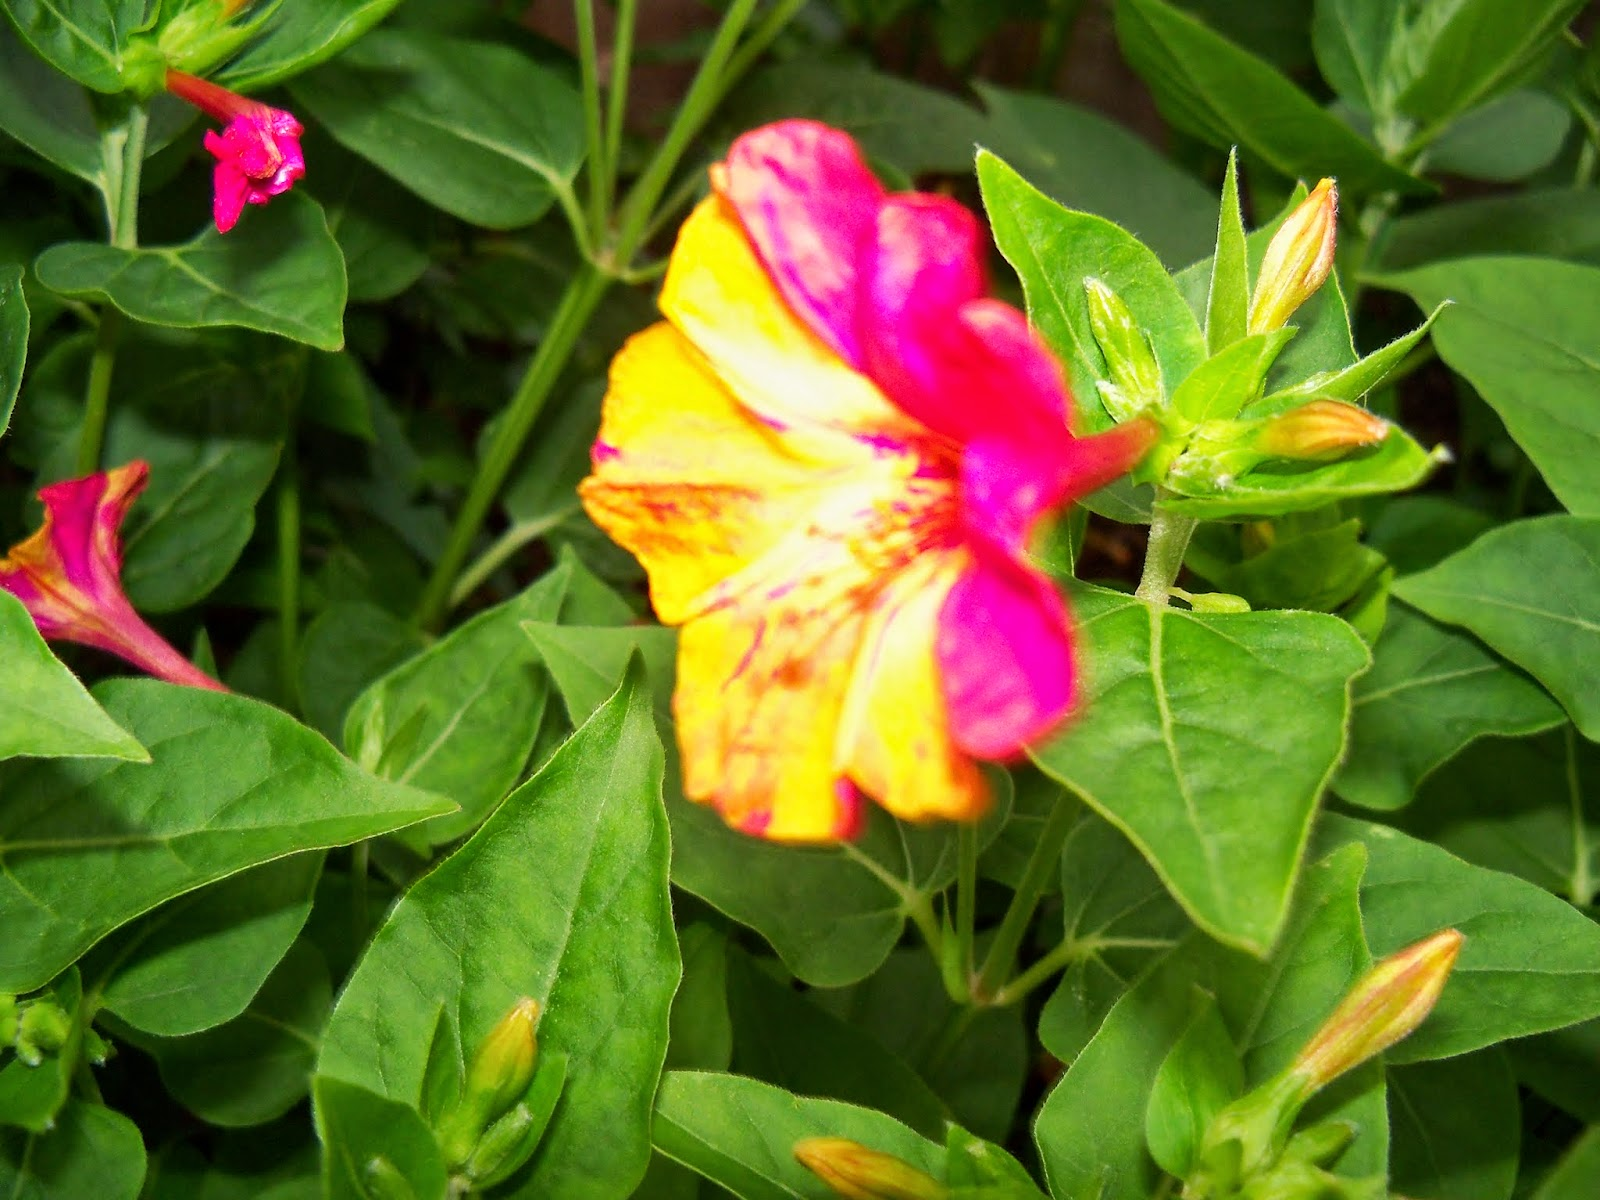 Gardening 2014 - 116_1958.JPG